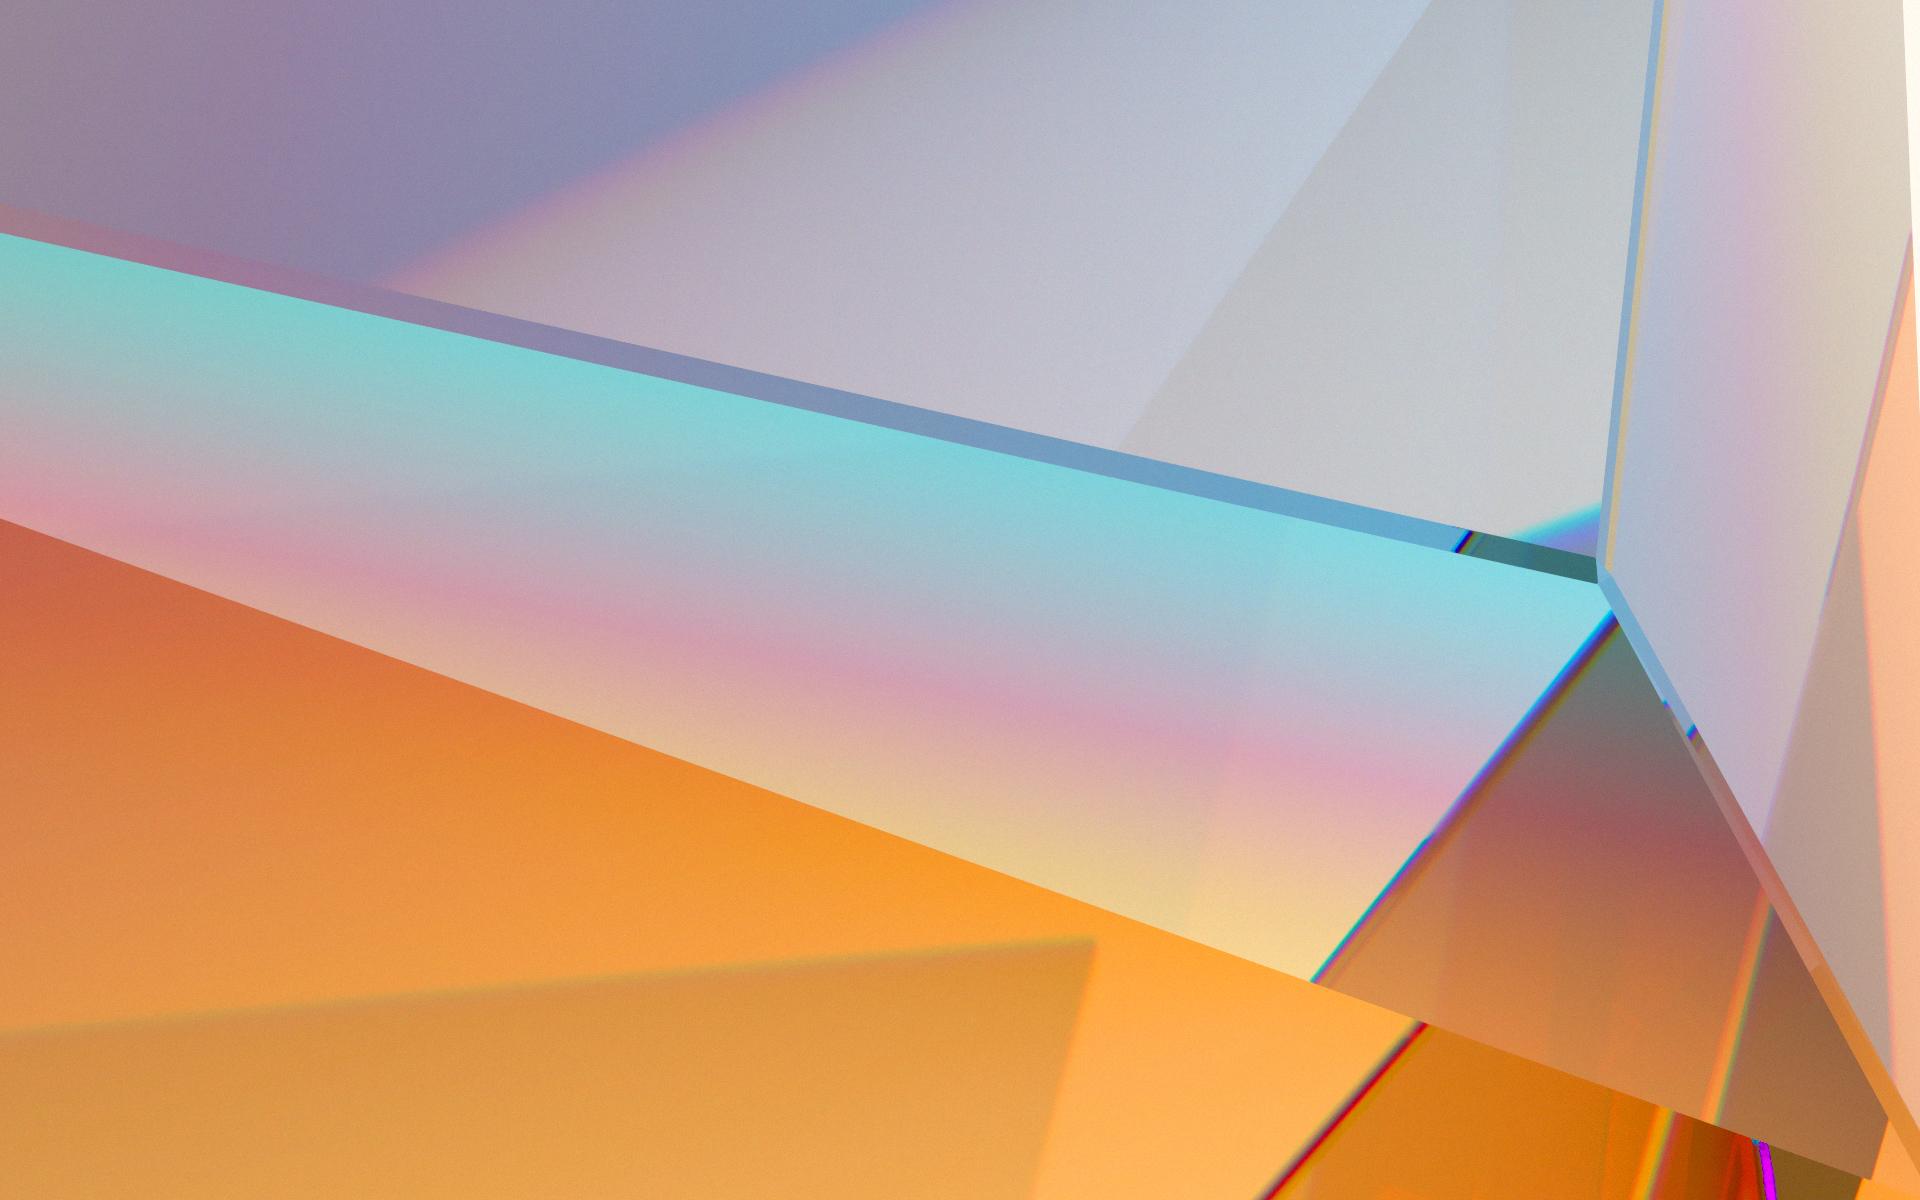 Eskimo Square Glass Prism_0003_Glass Prism 06.jpg